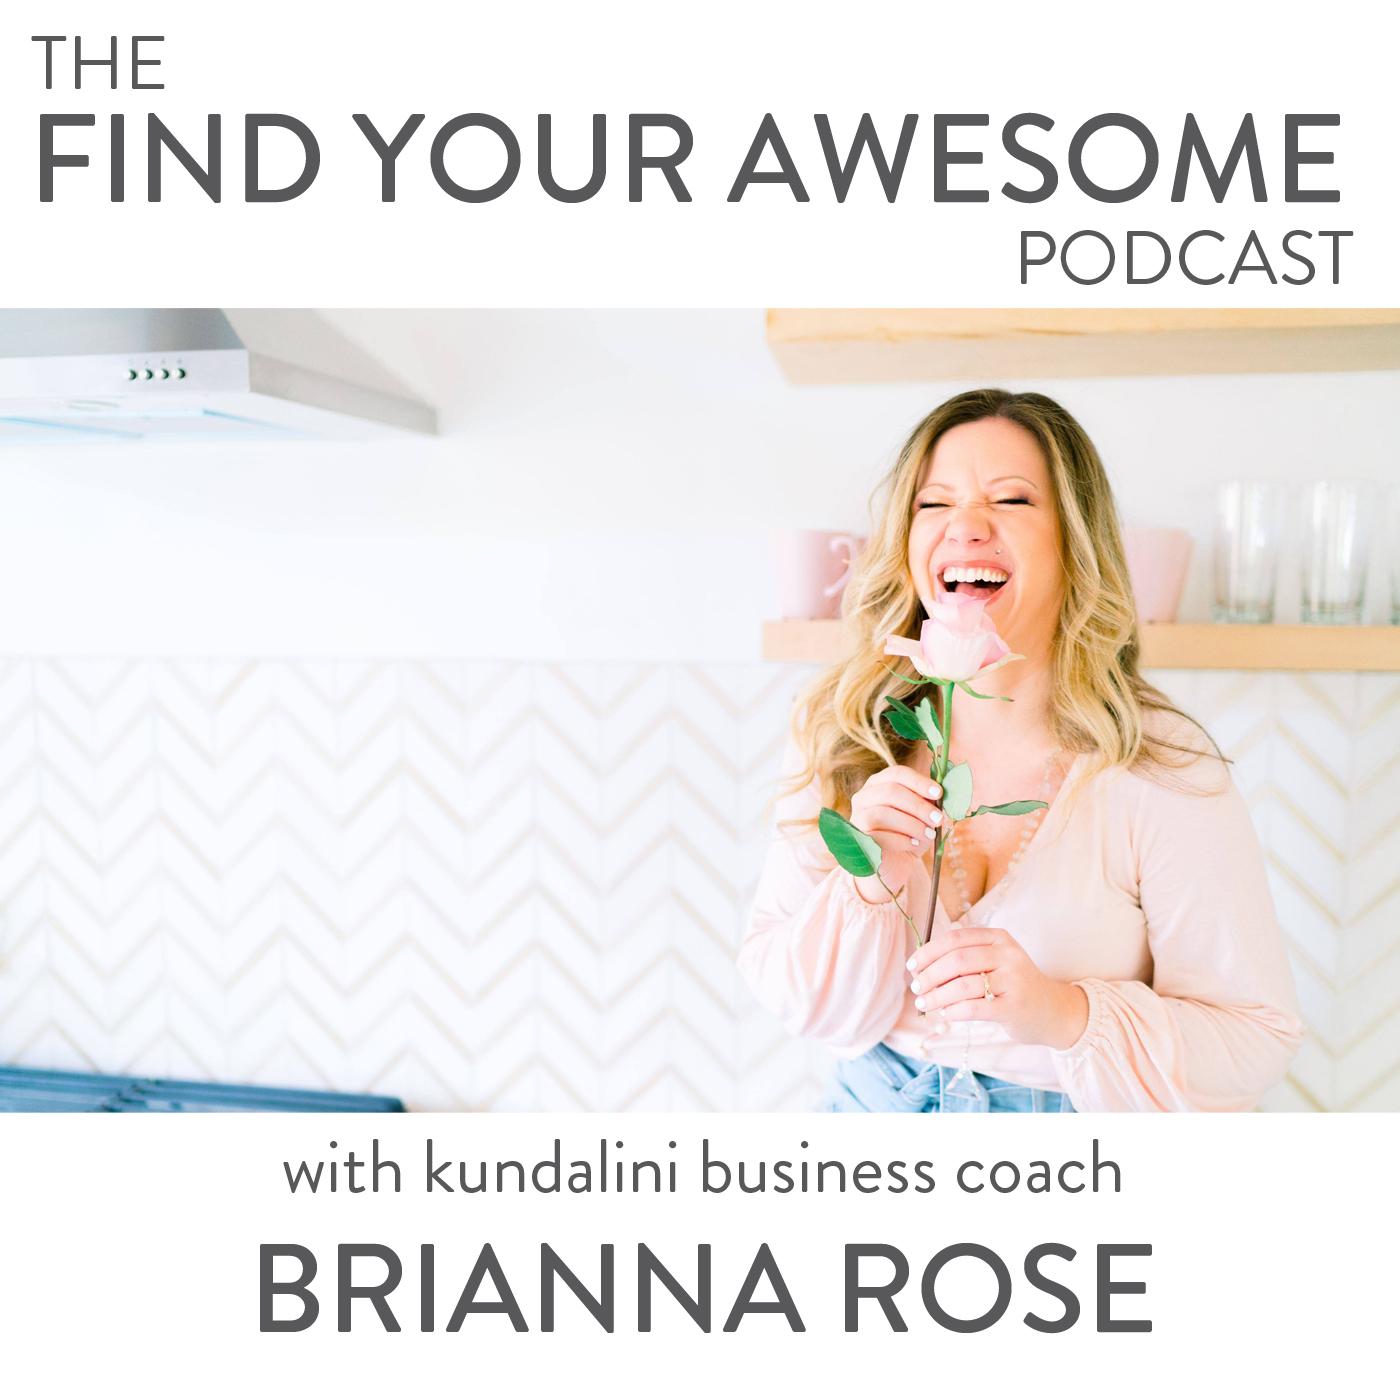 BriannaRose_podcast_coverart.jpg